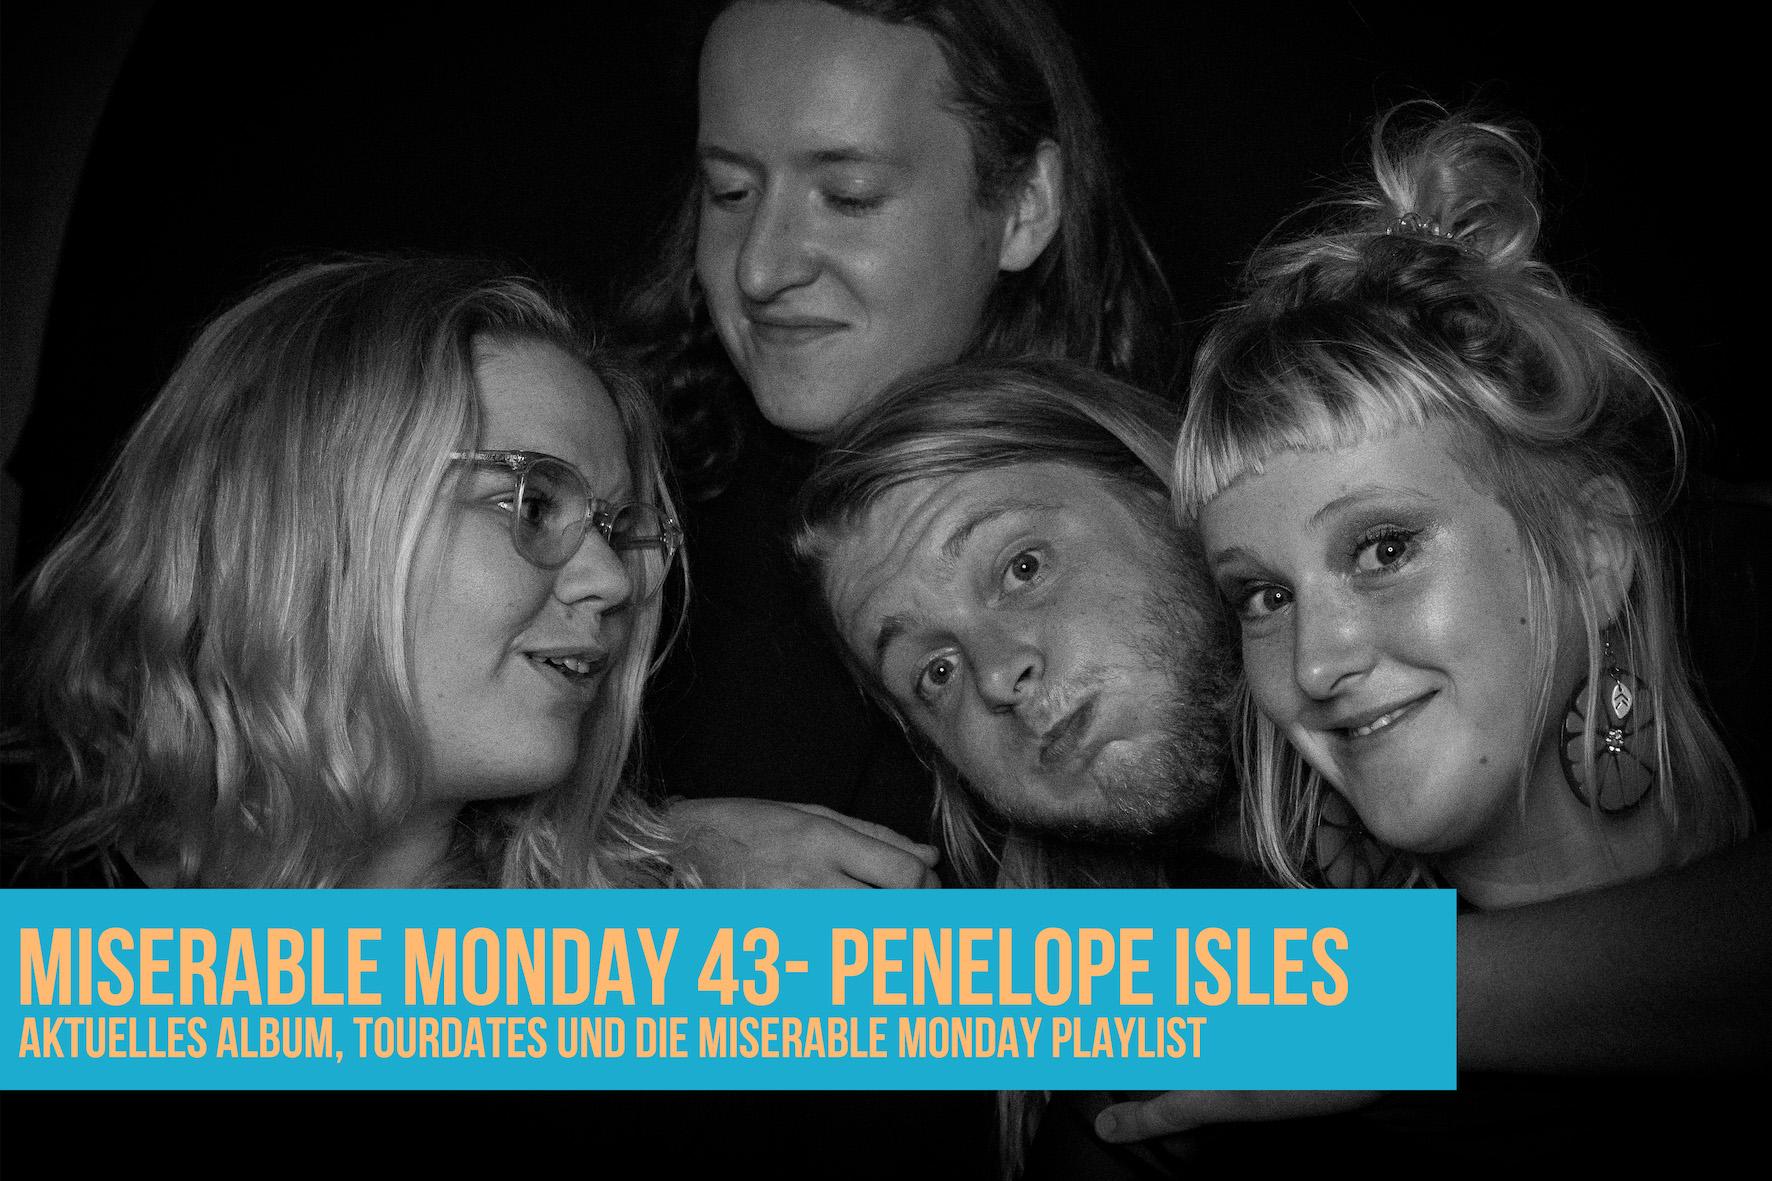 043 - Penelope Isles